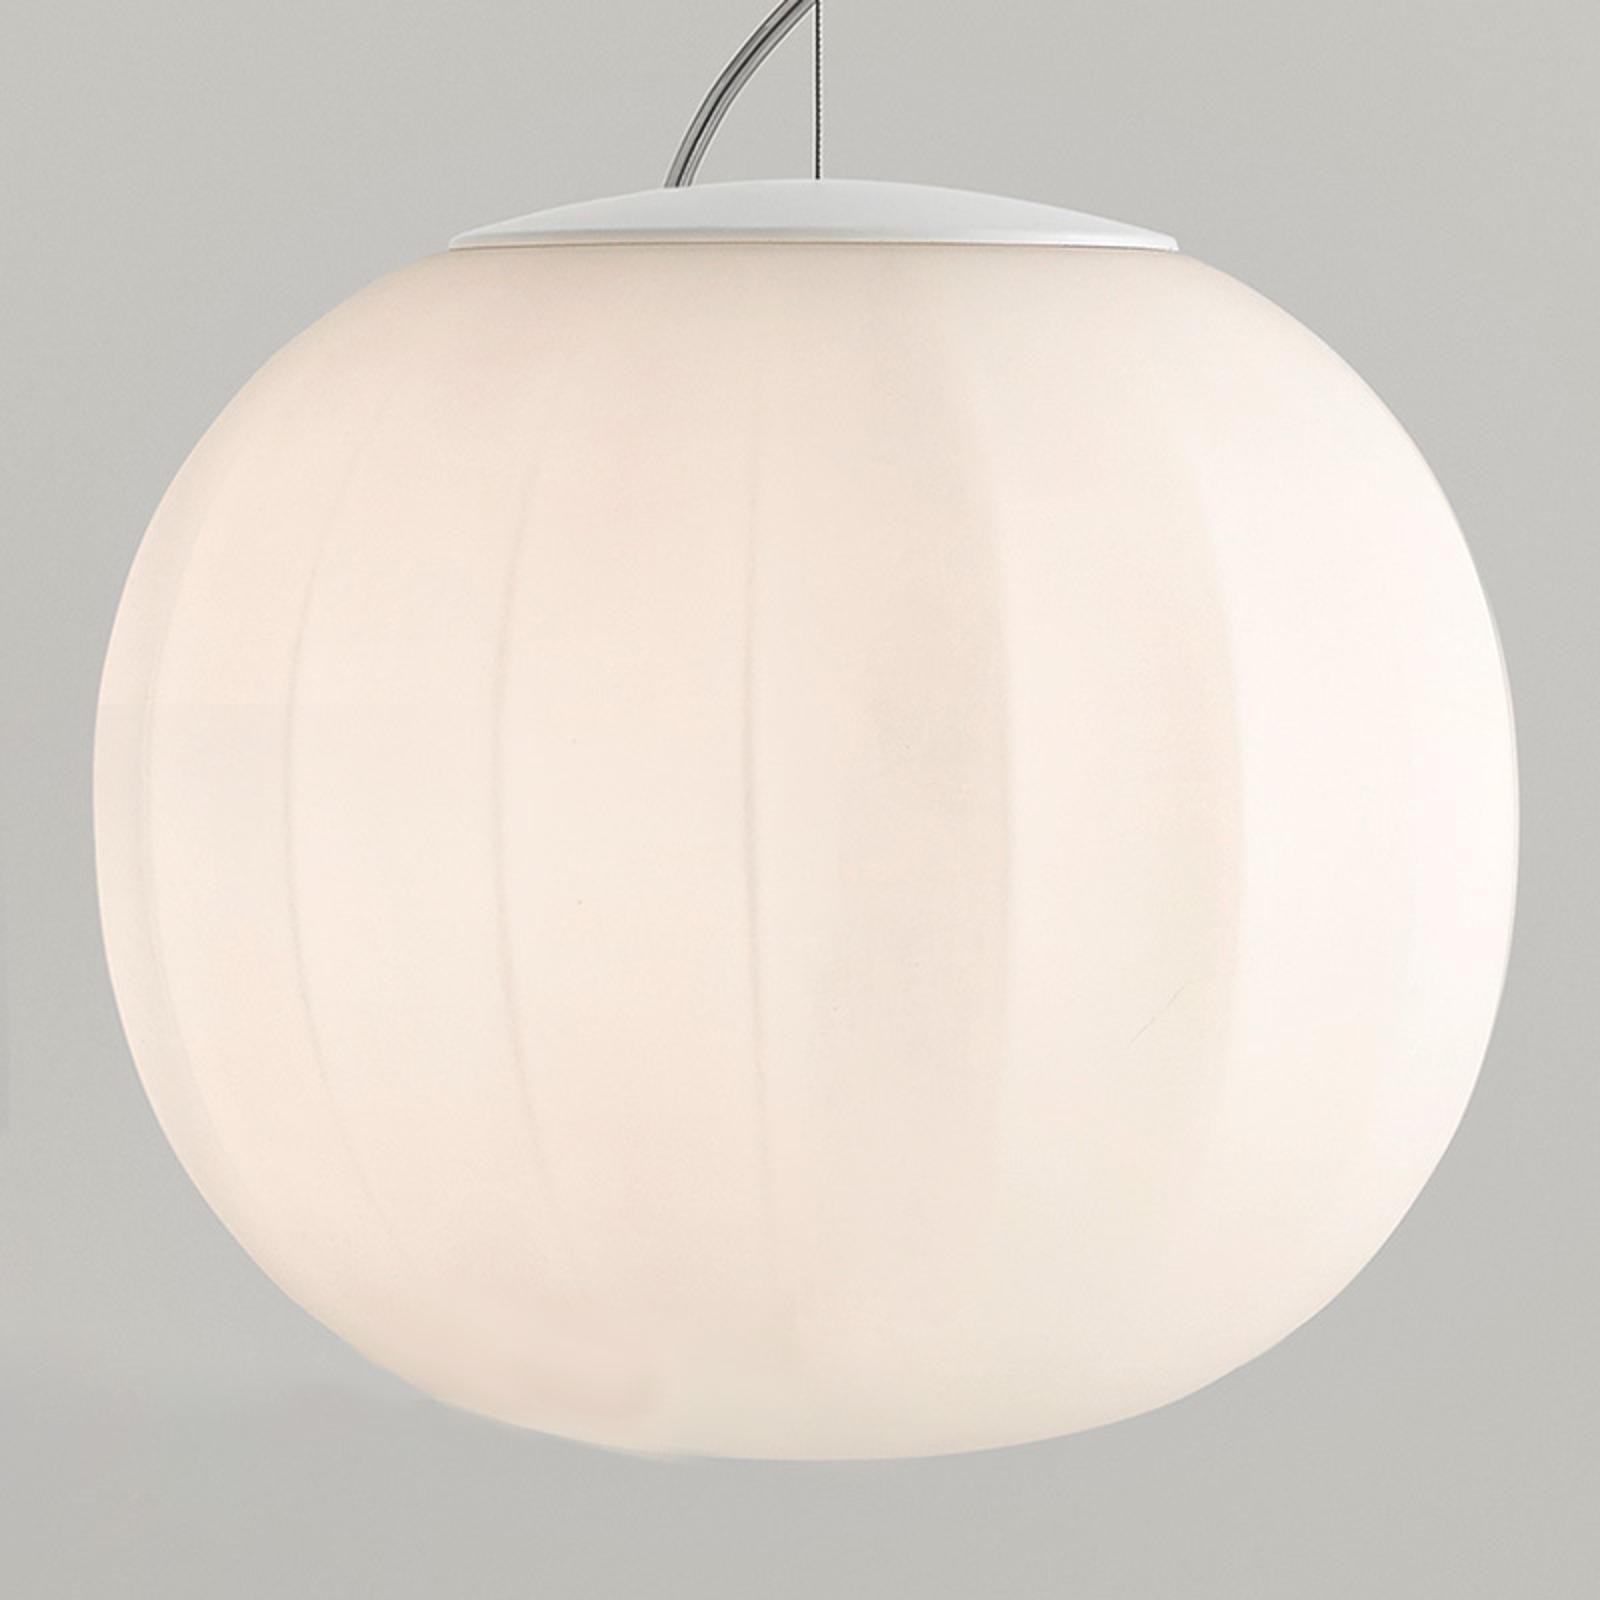 Luceplan Lita hanglamp afhanghoogte wit Ø 30 cm